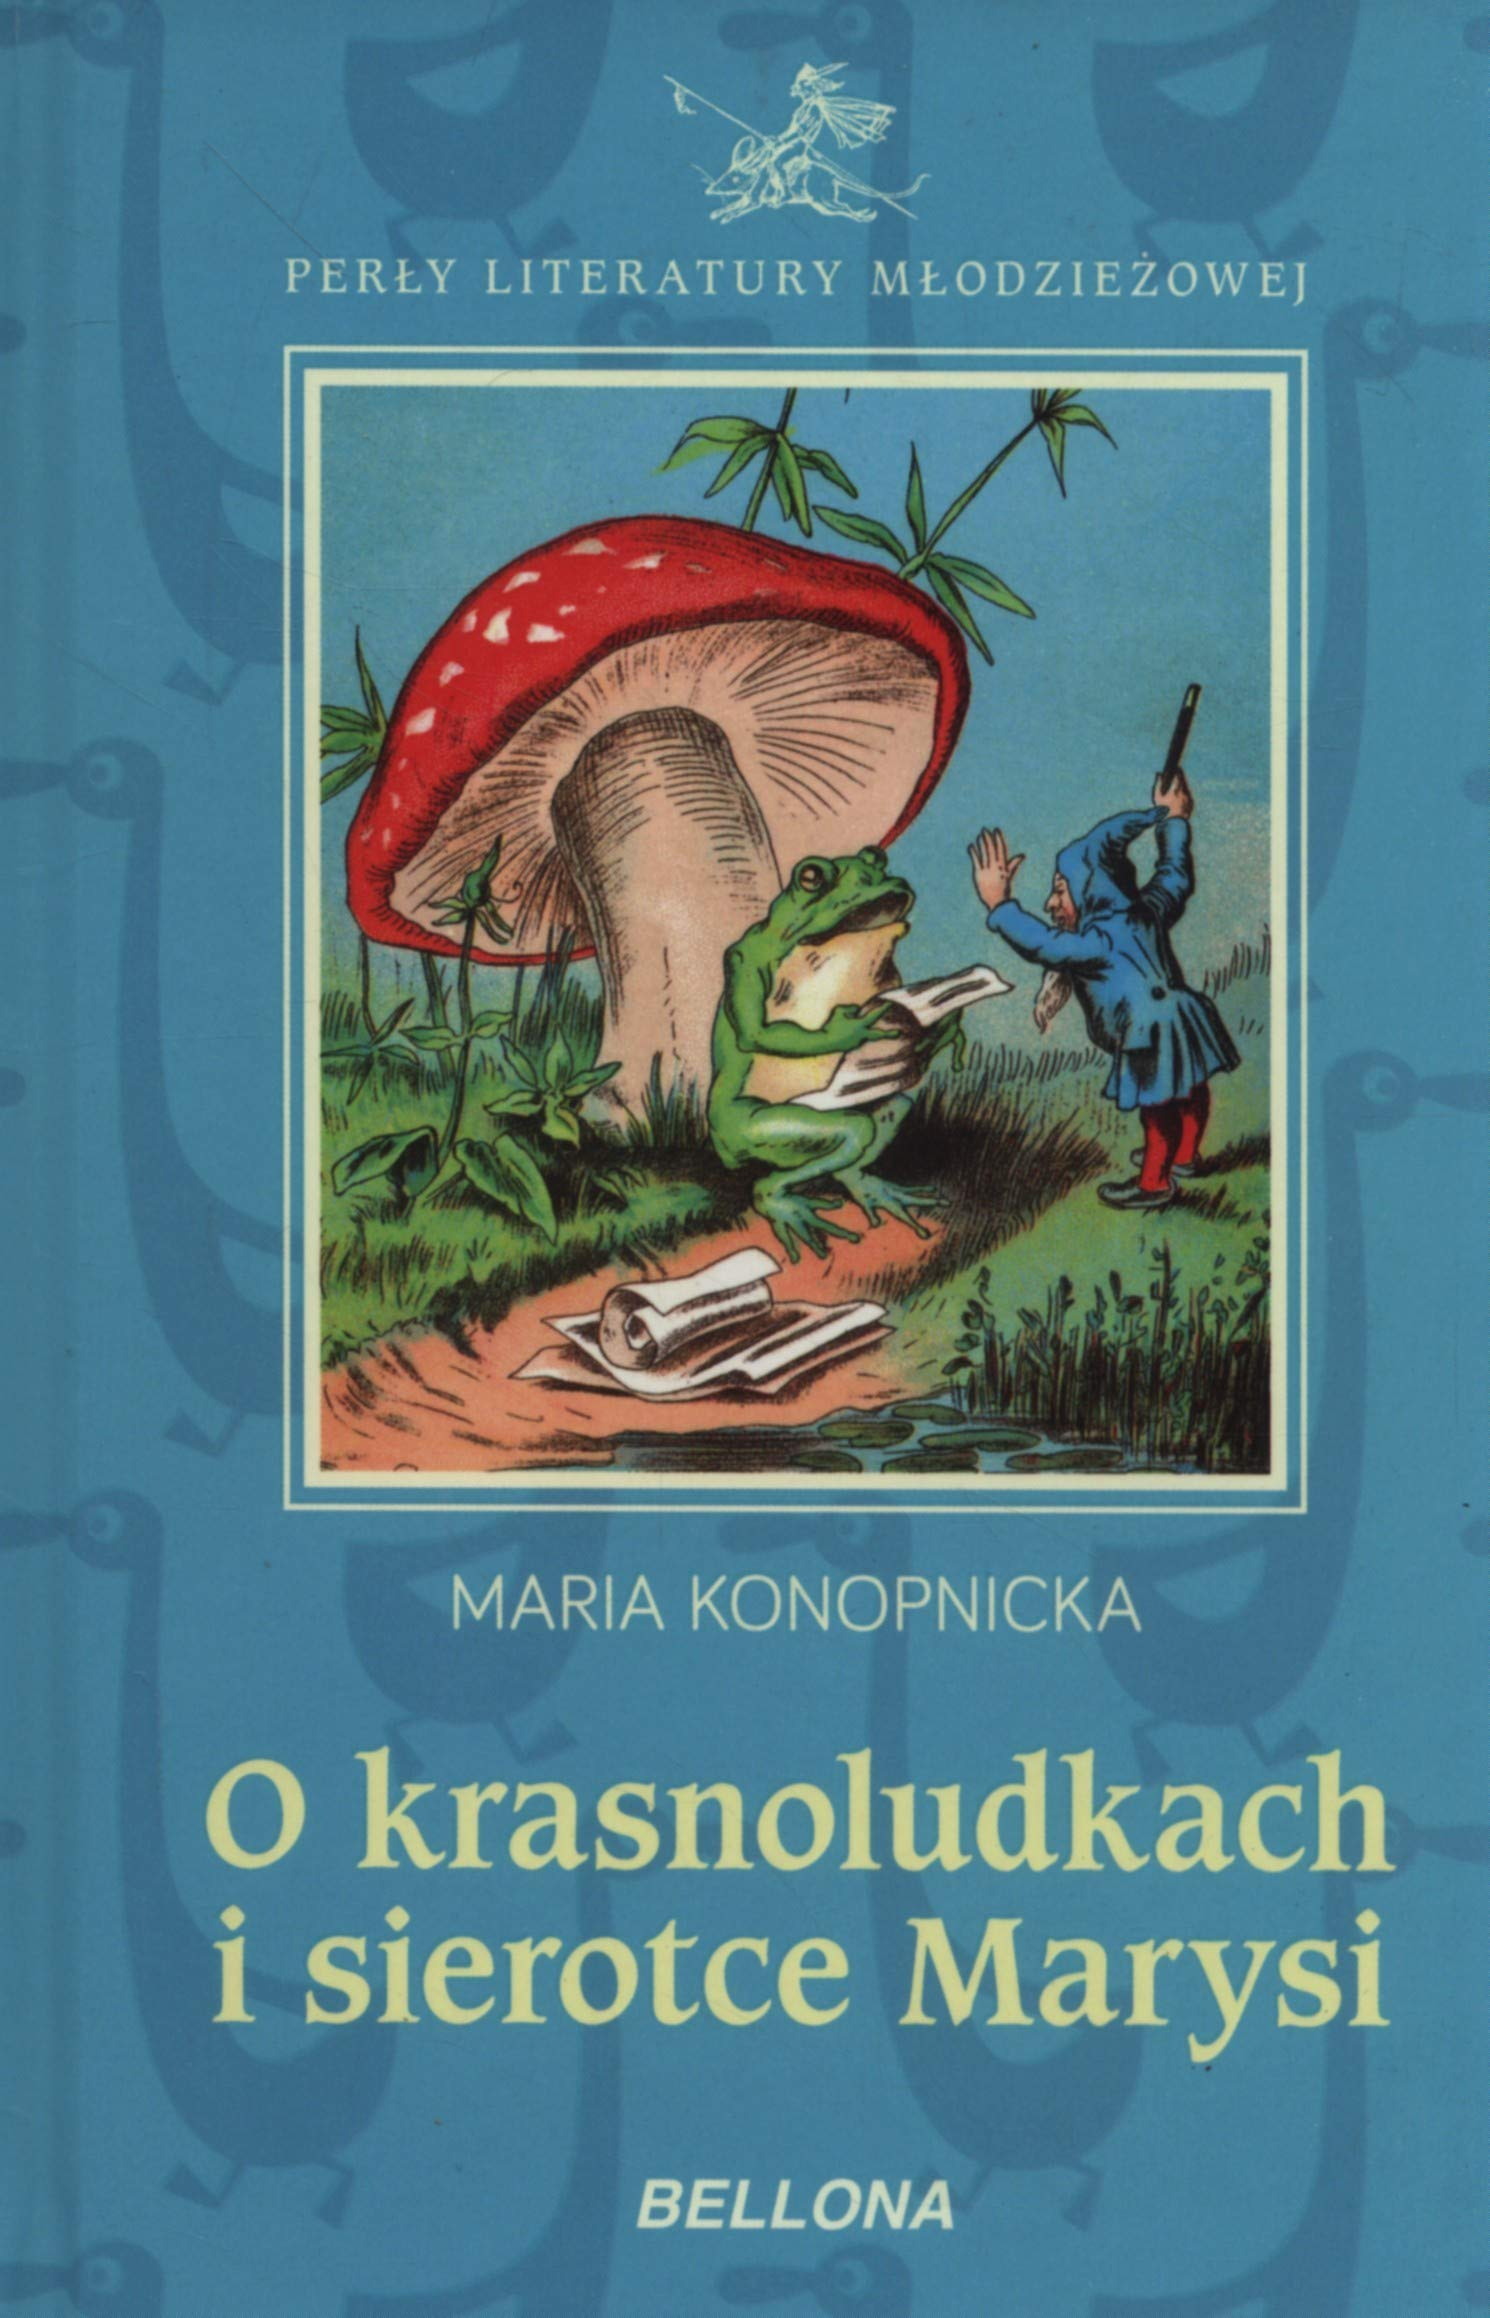 O Krasnoludkach I Sierotce Marysi Maria Konopnicka